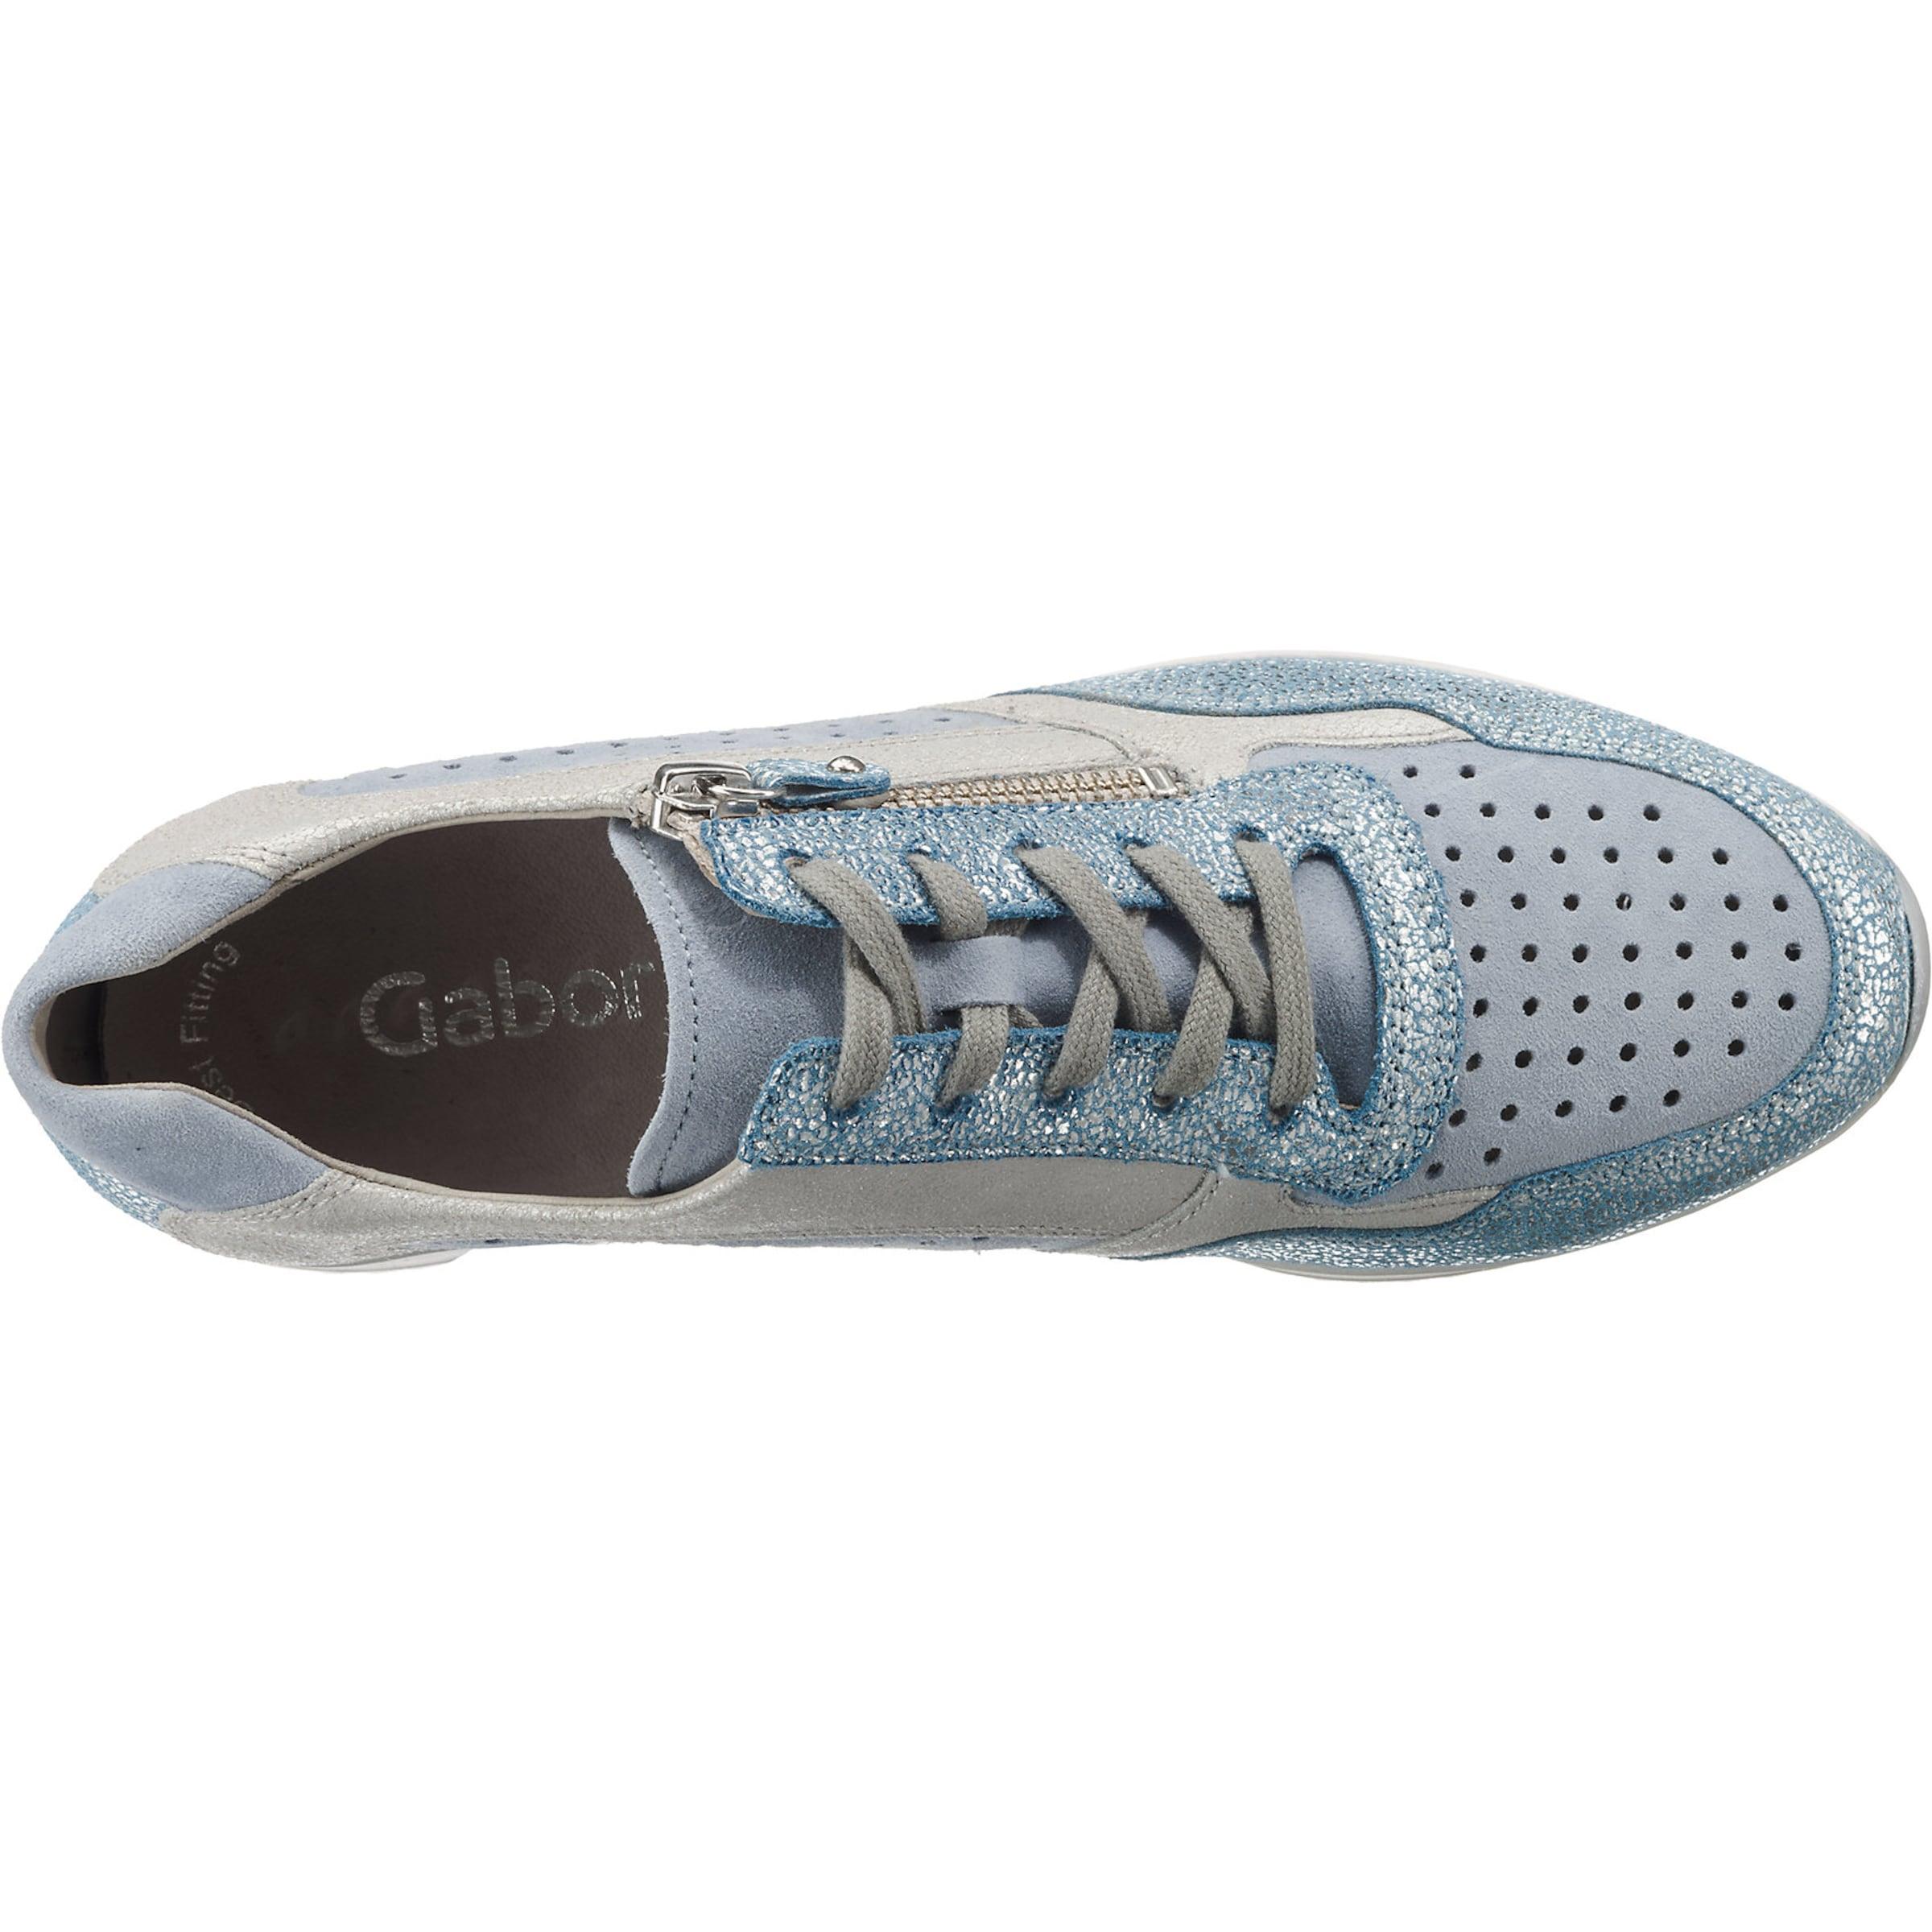 RauchblauSilber In In Gabor Sneaker RauchblauSilber Gabor RauchblauSilber In Gabor Sneaker Sneaker nwOk0P